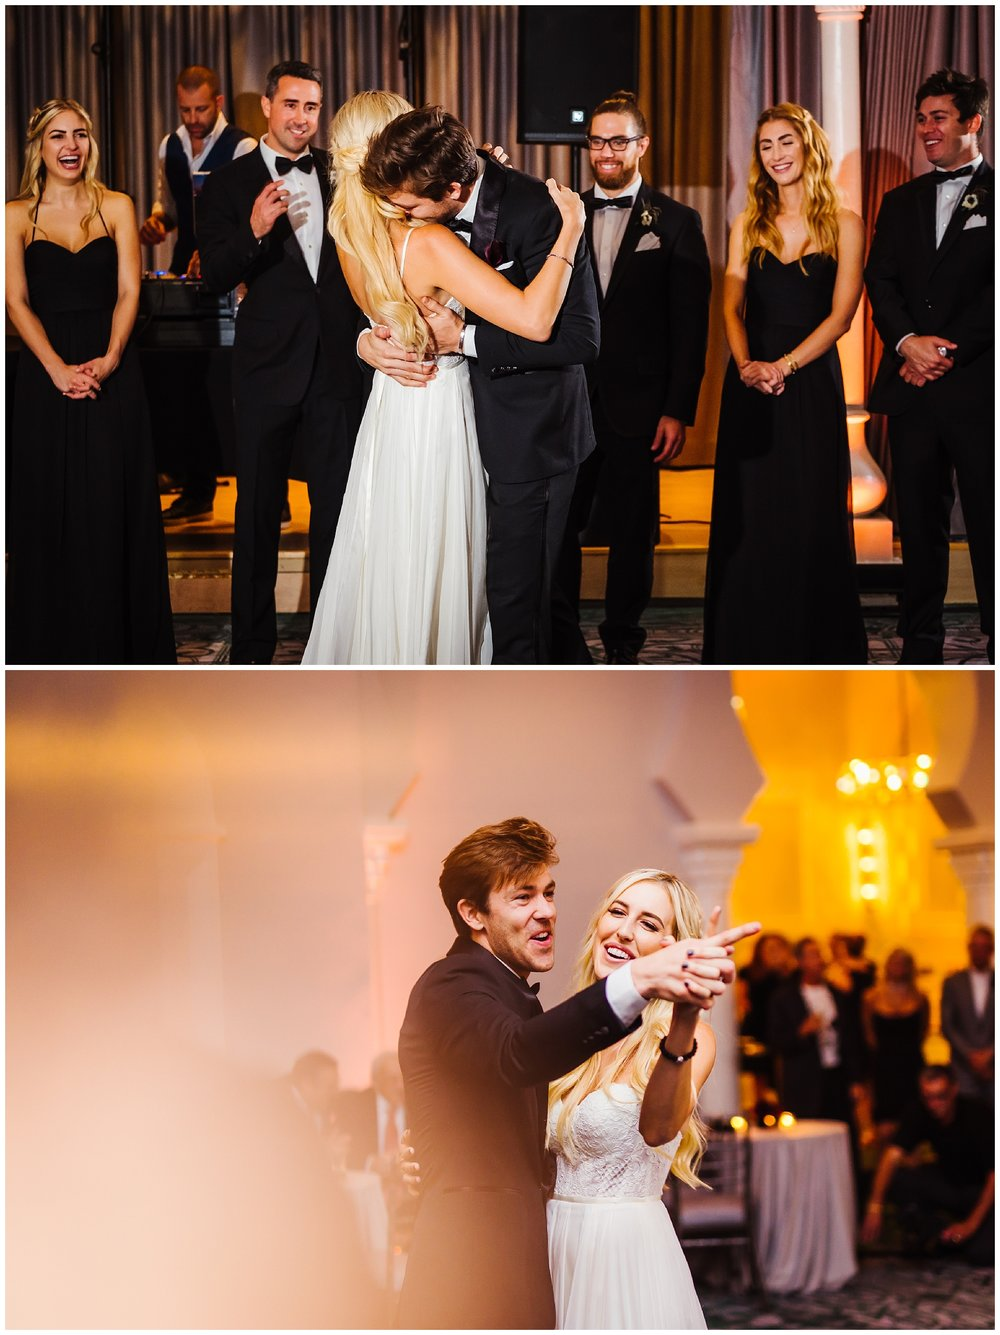 st-pete-wedding-photographer-backyard-luxury-snell-isle-vinoy_0058.jpg